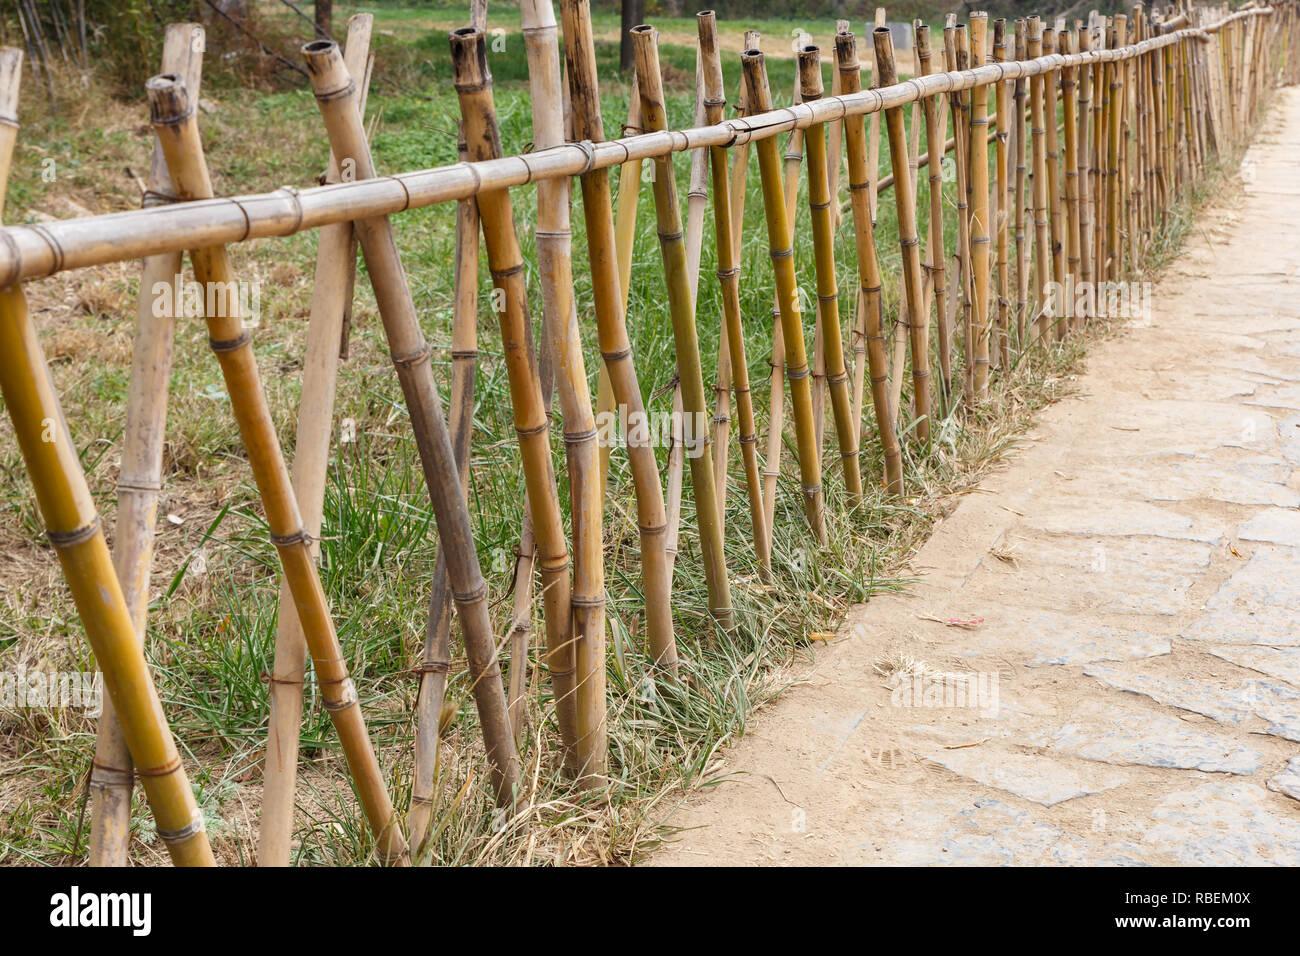 Bambus Zaun Entlang Ein Fussweg In Einem Park Stockfotografie Alamy